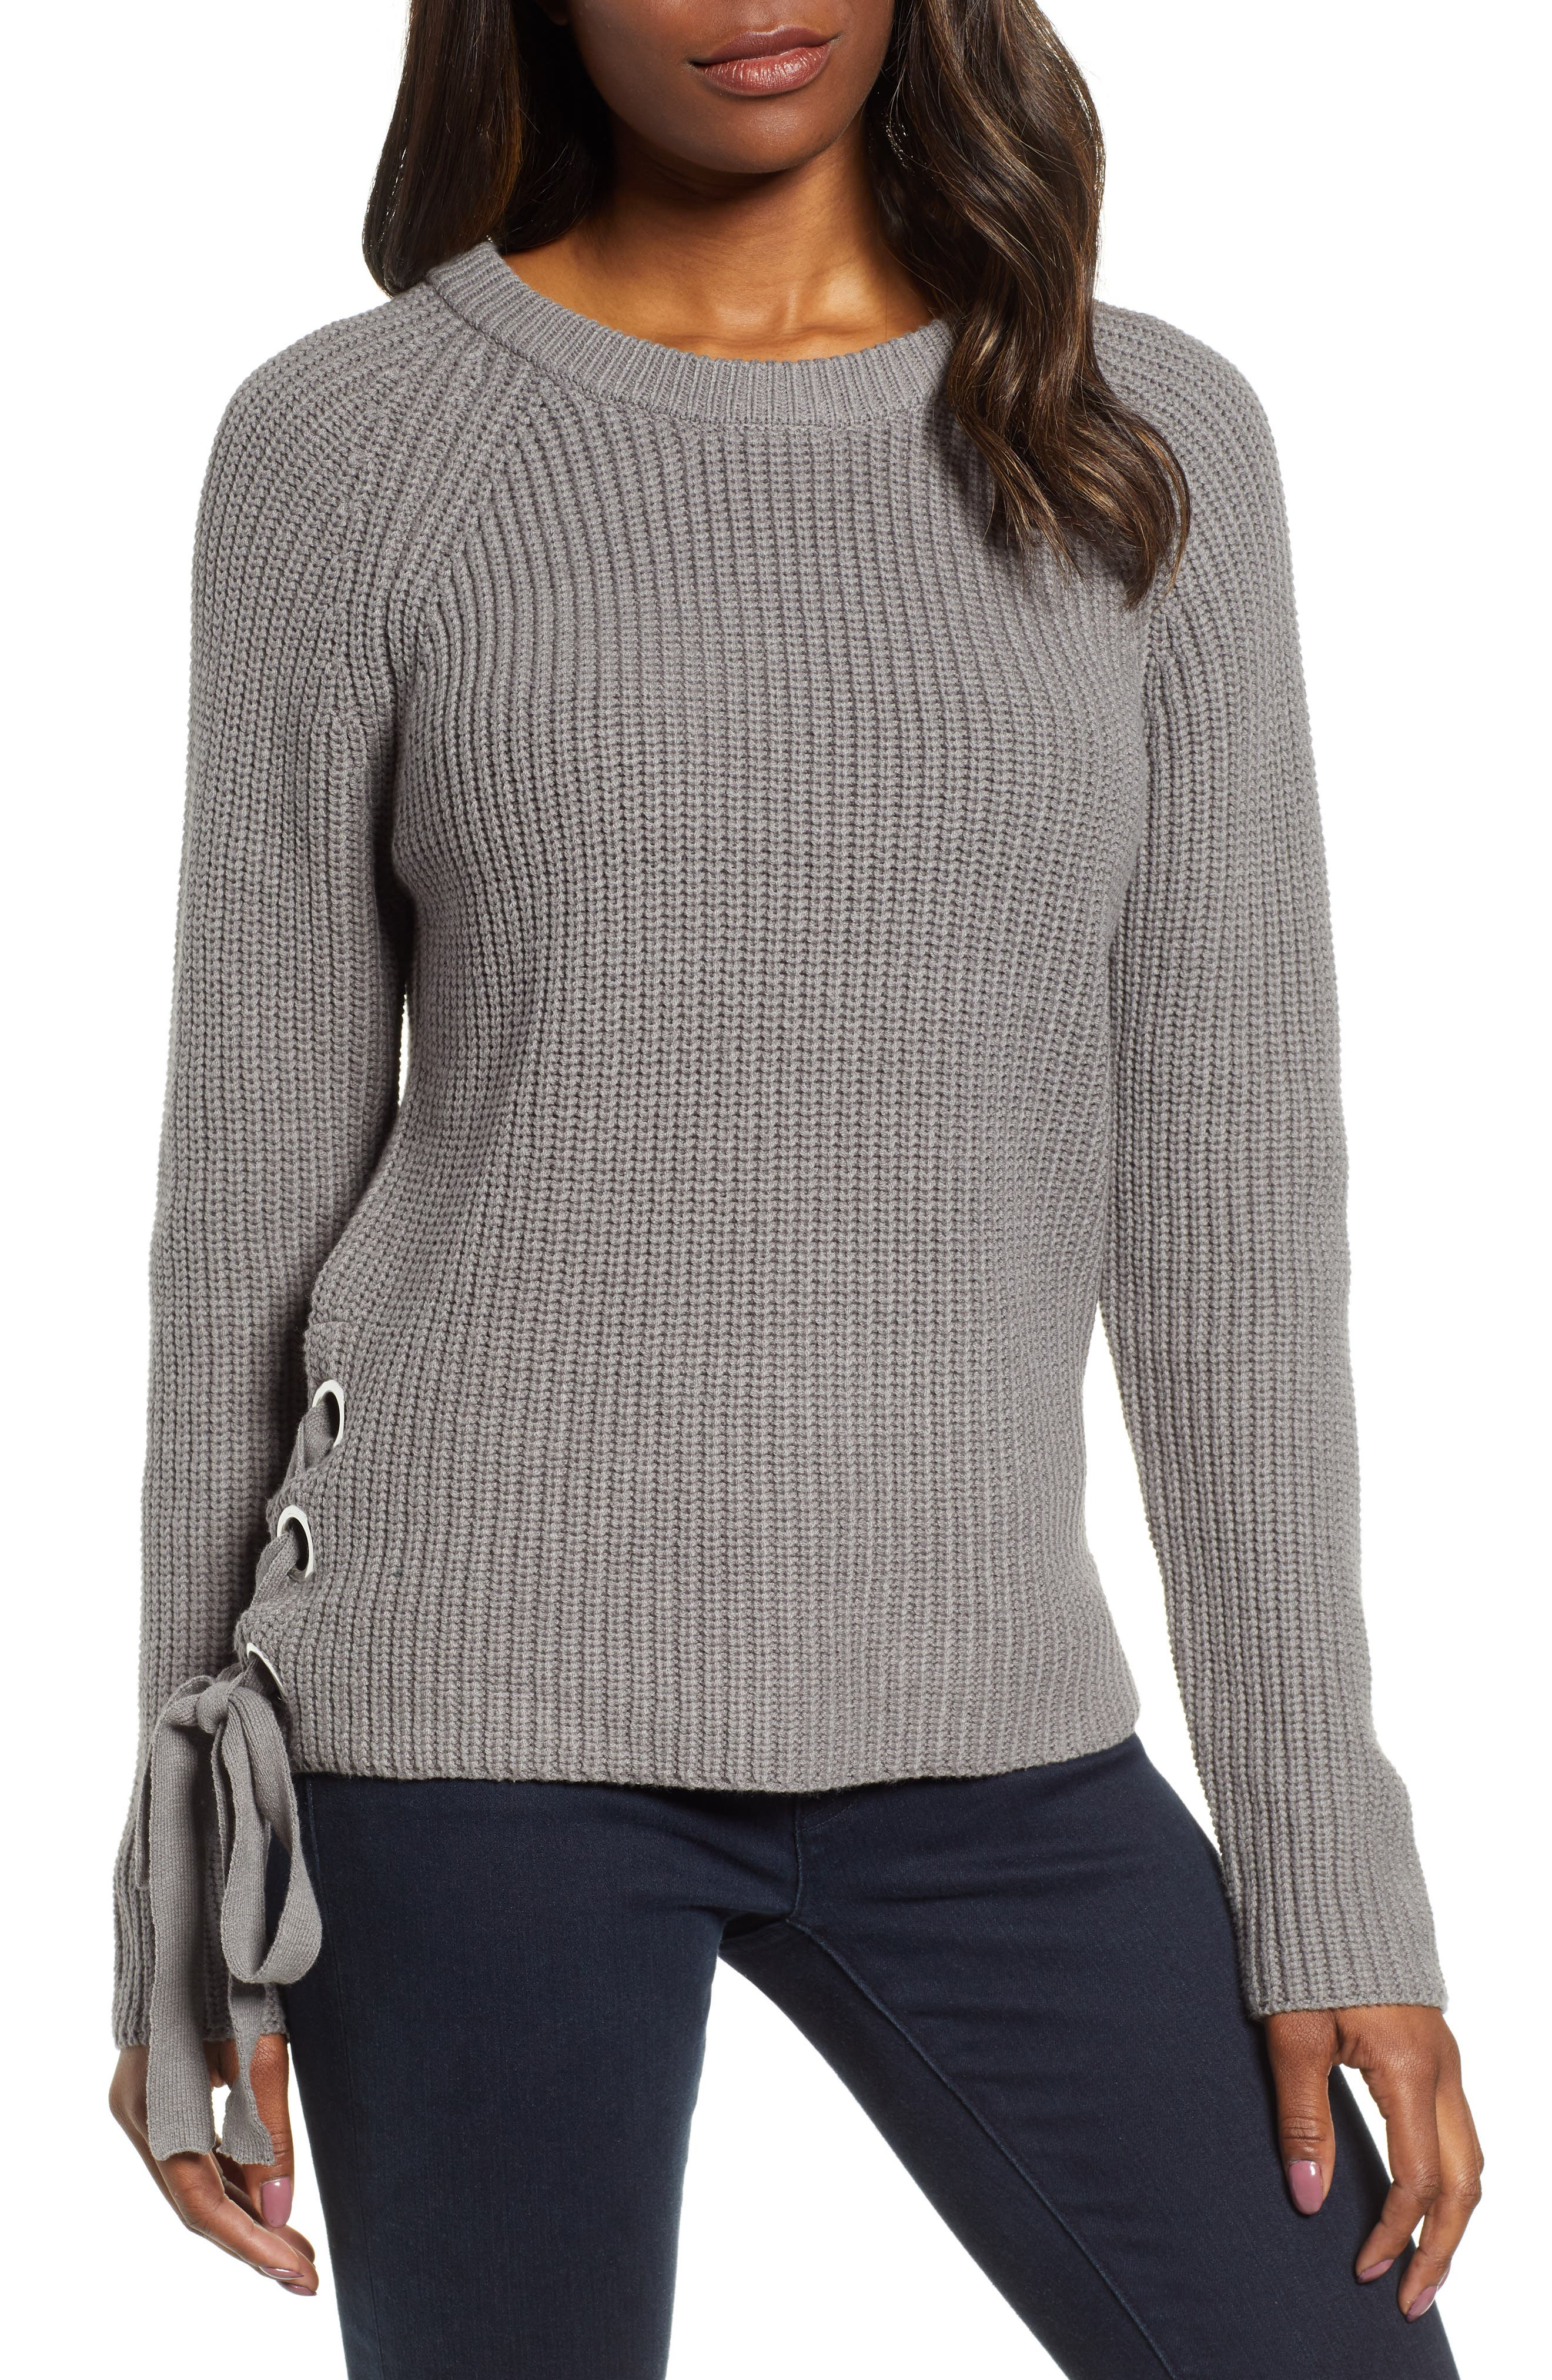 Adire Sweater,                         Main,                         color, GREY